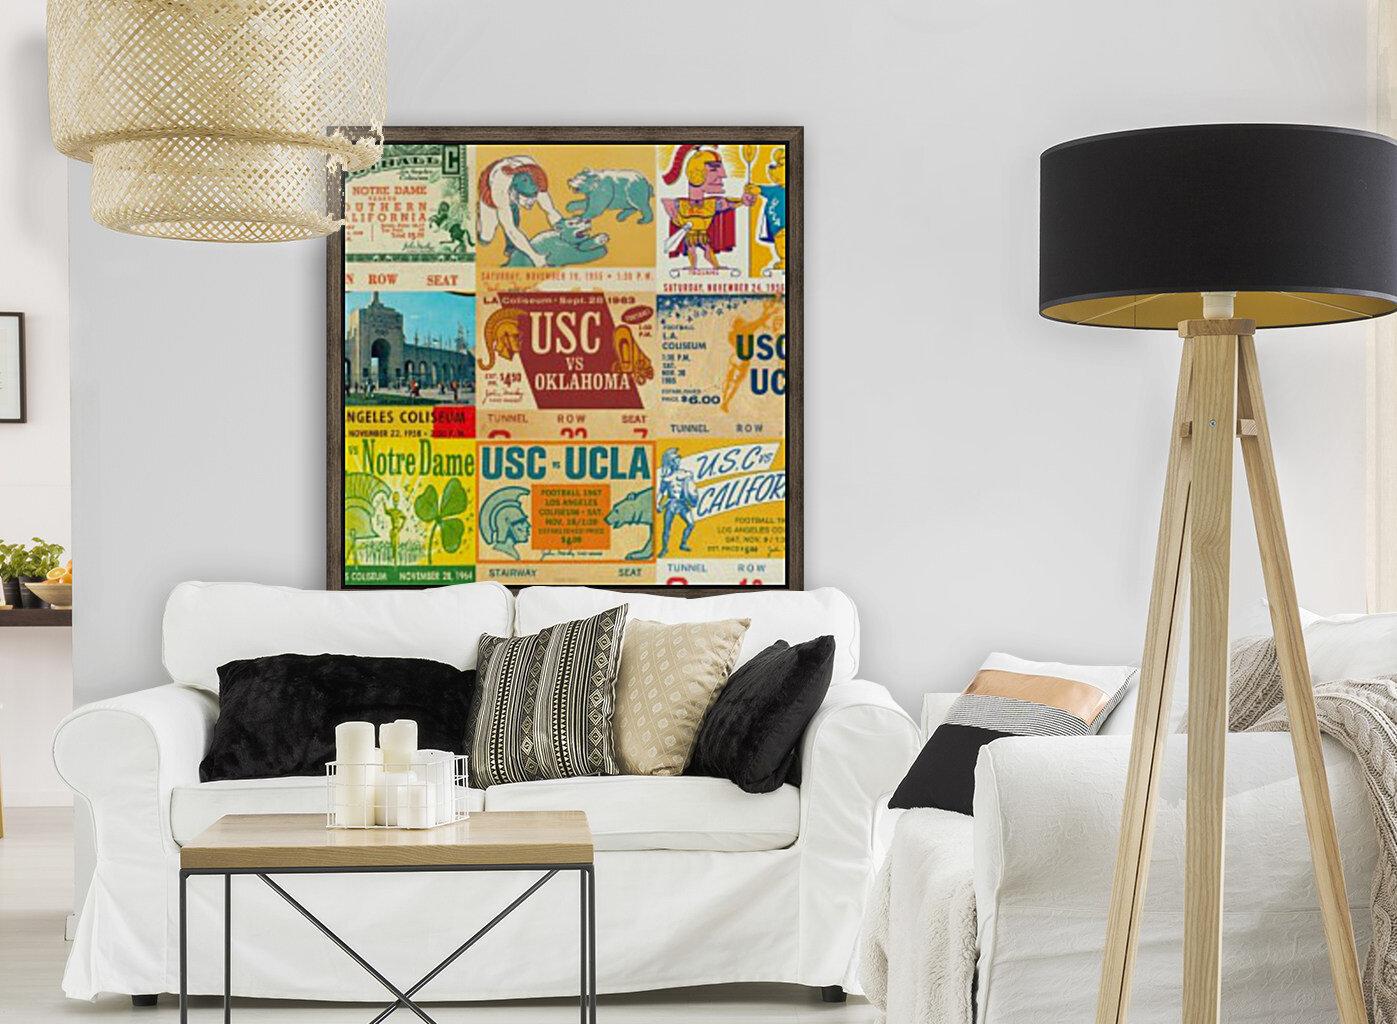 USC Trojans Football Ticket Stub Collage  Art